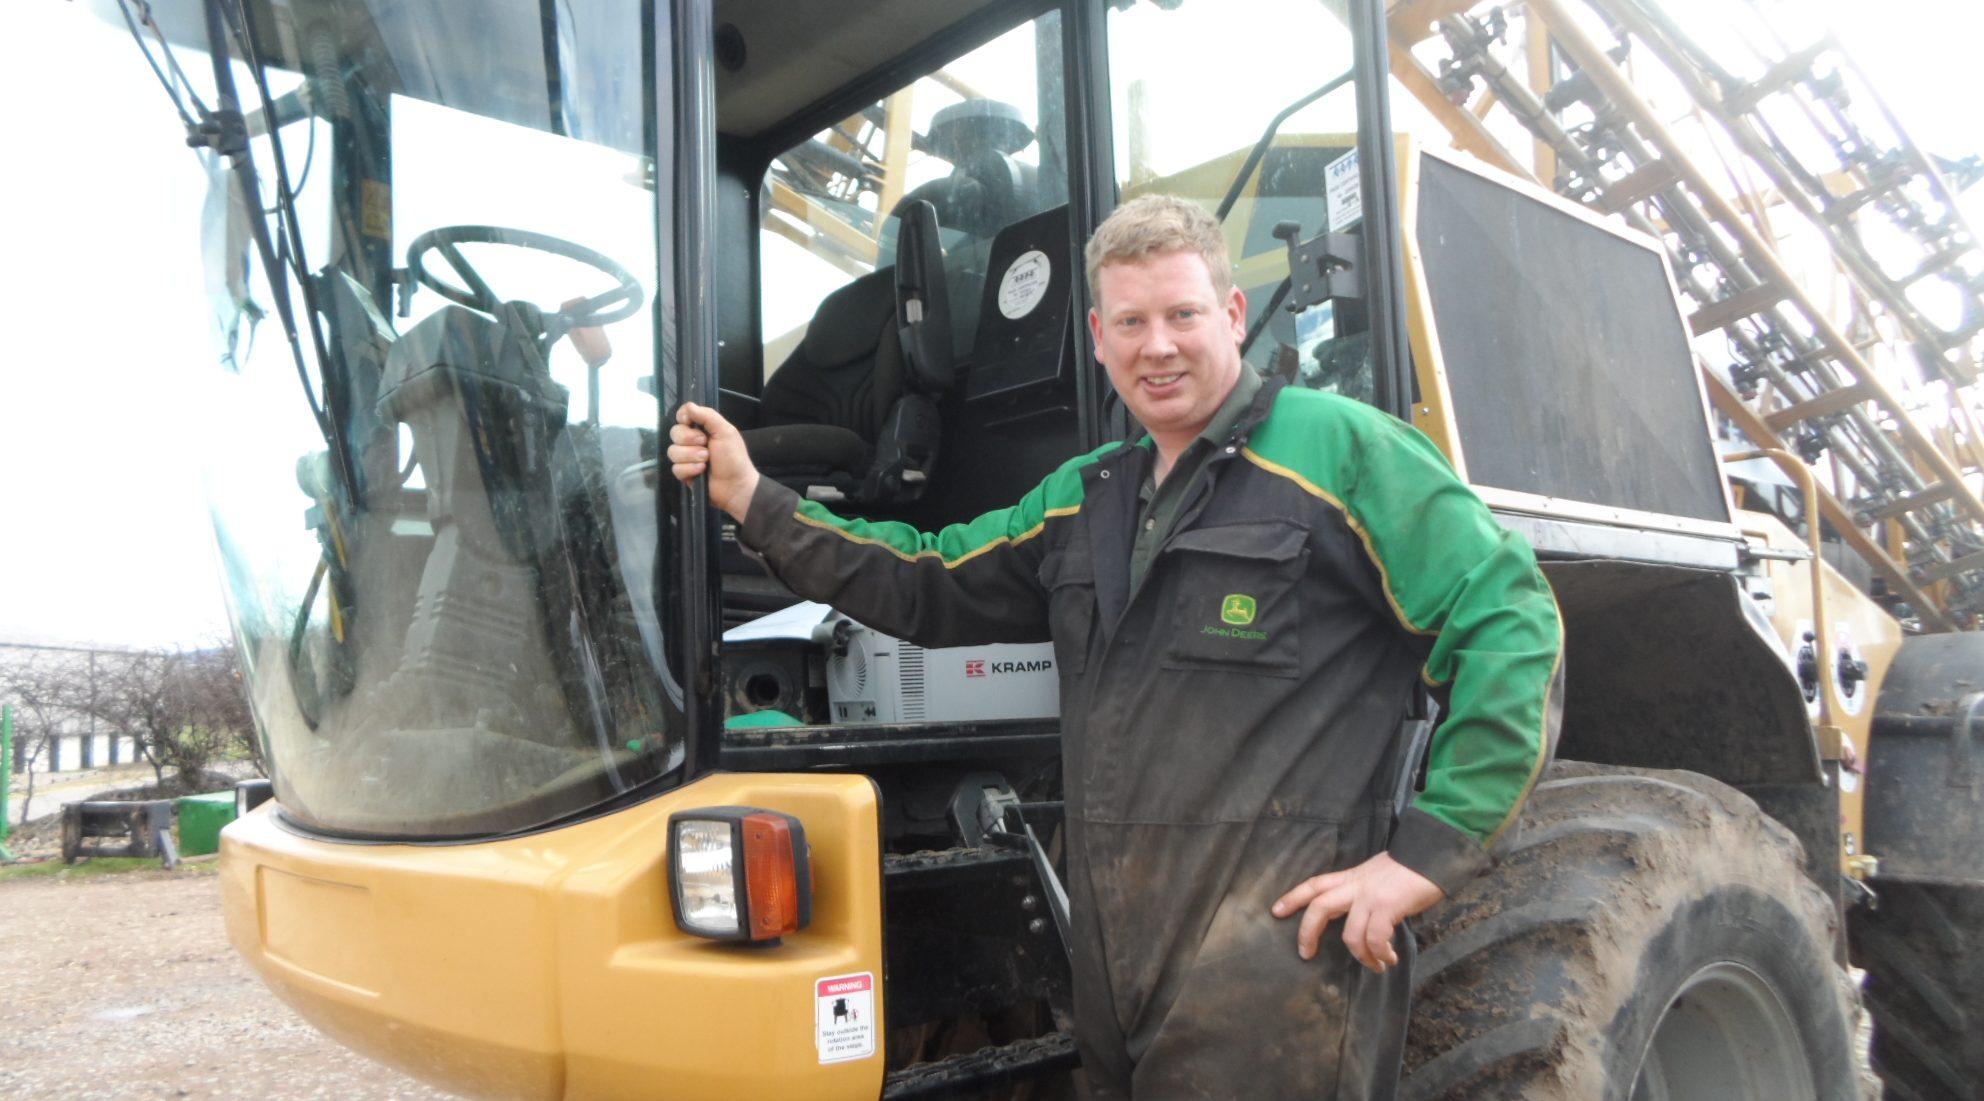 EYES FIRMLY FIXED ON FARMING'S FUTURE